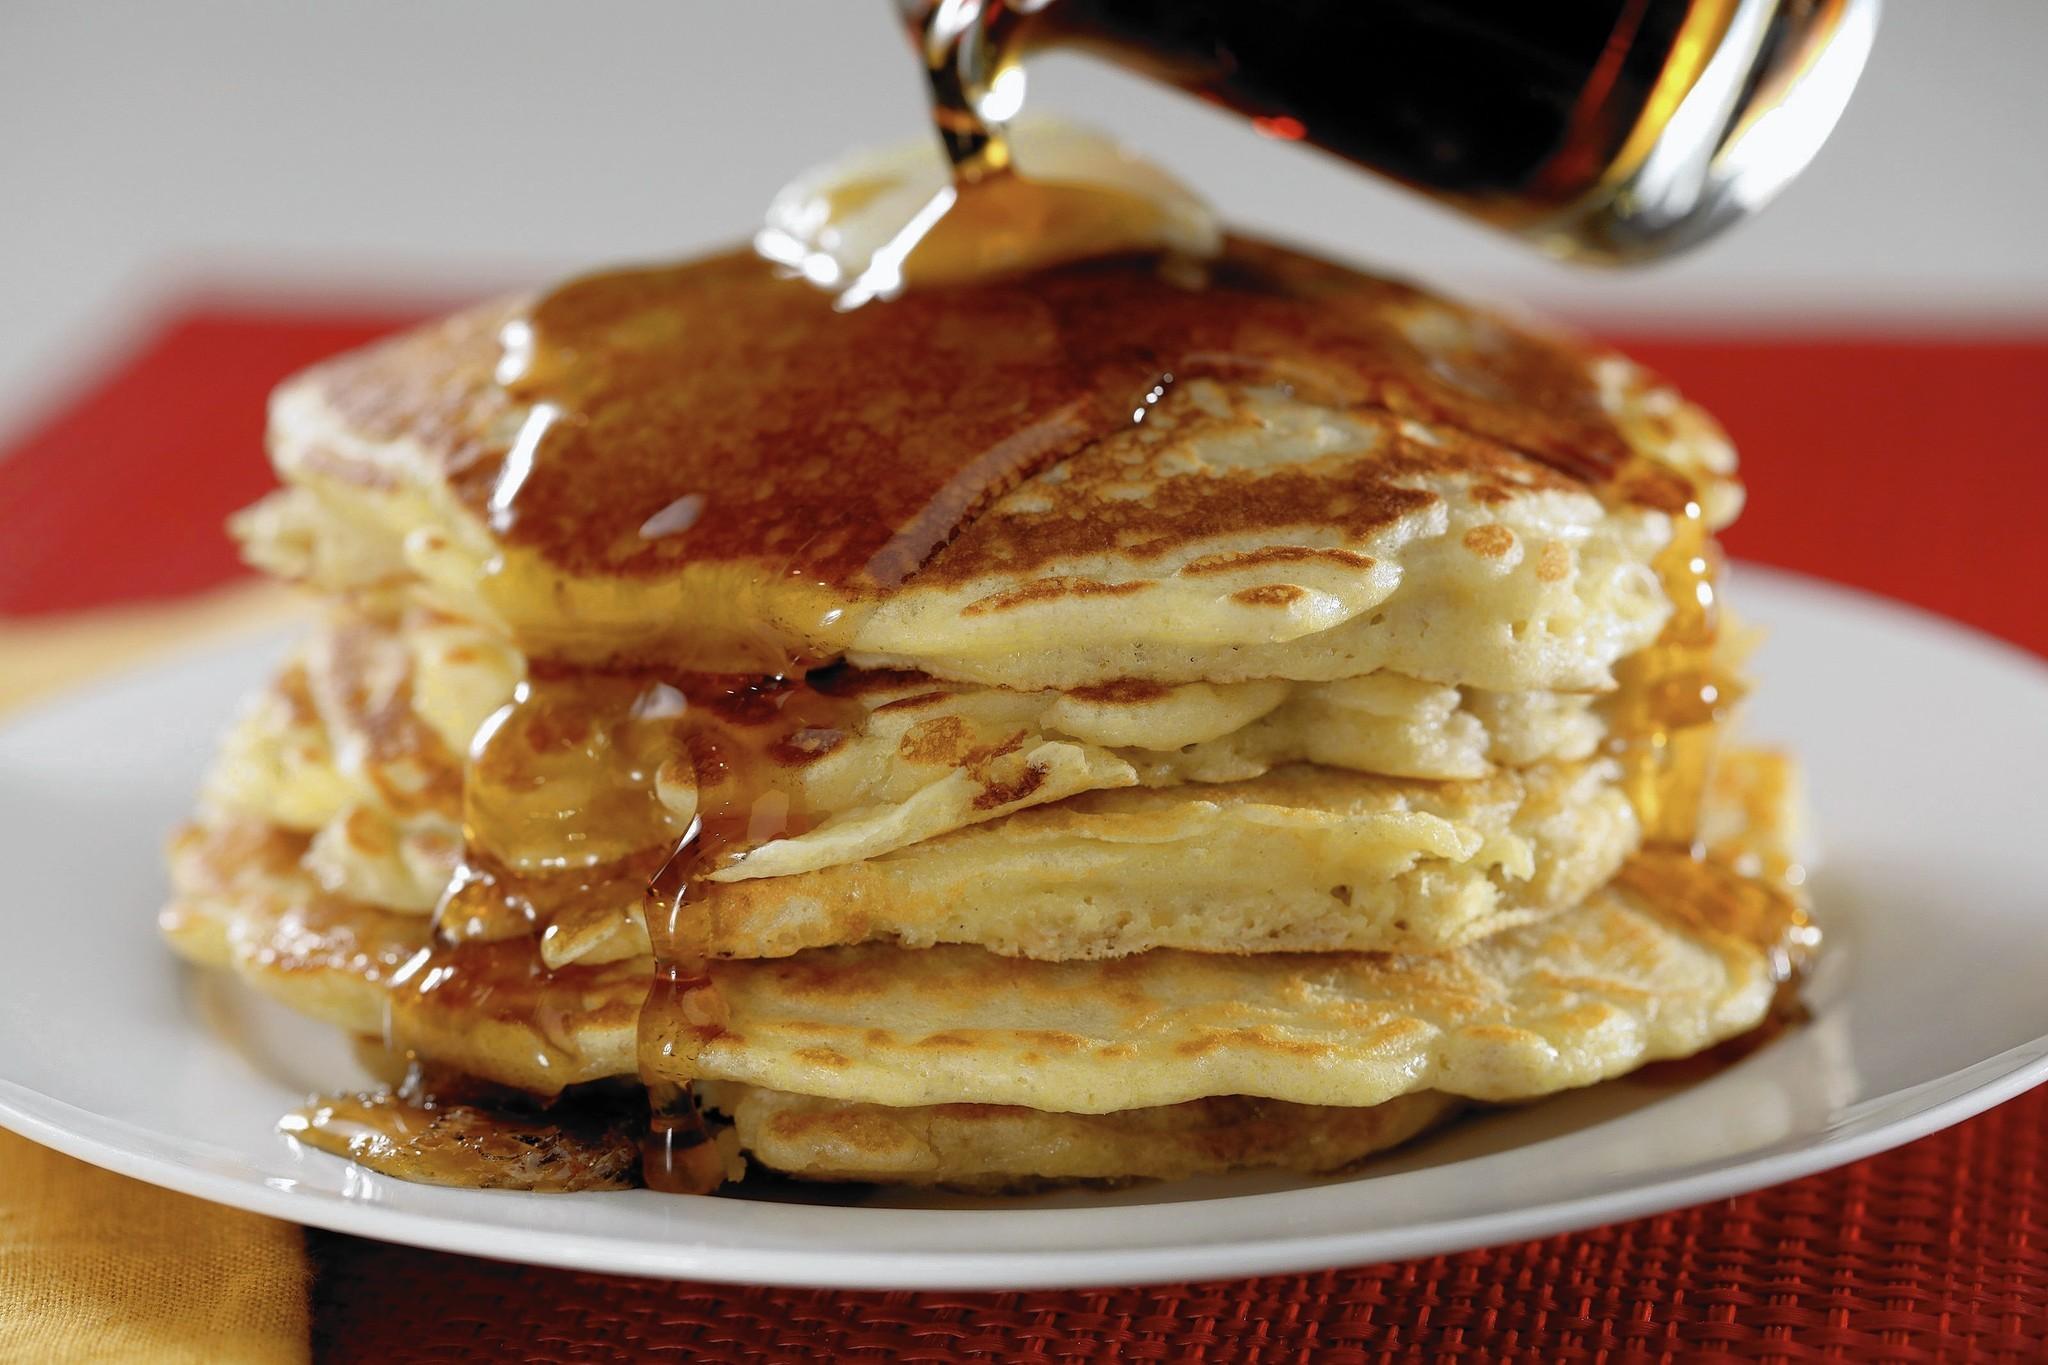 The ultimate pancake, made 4 ways